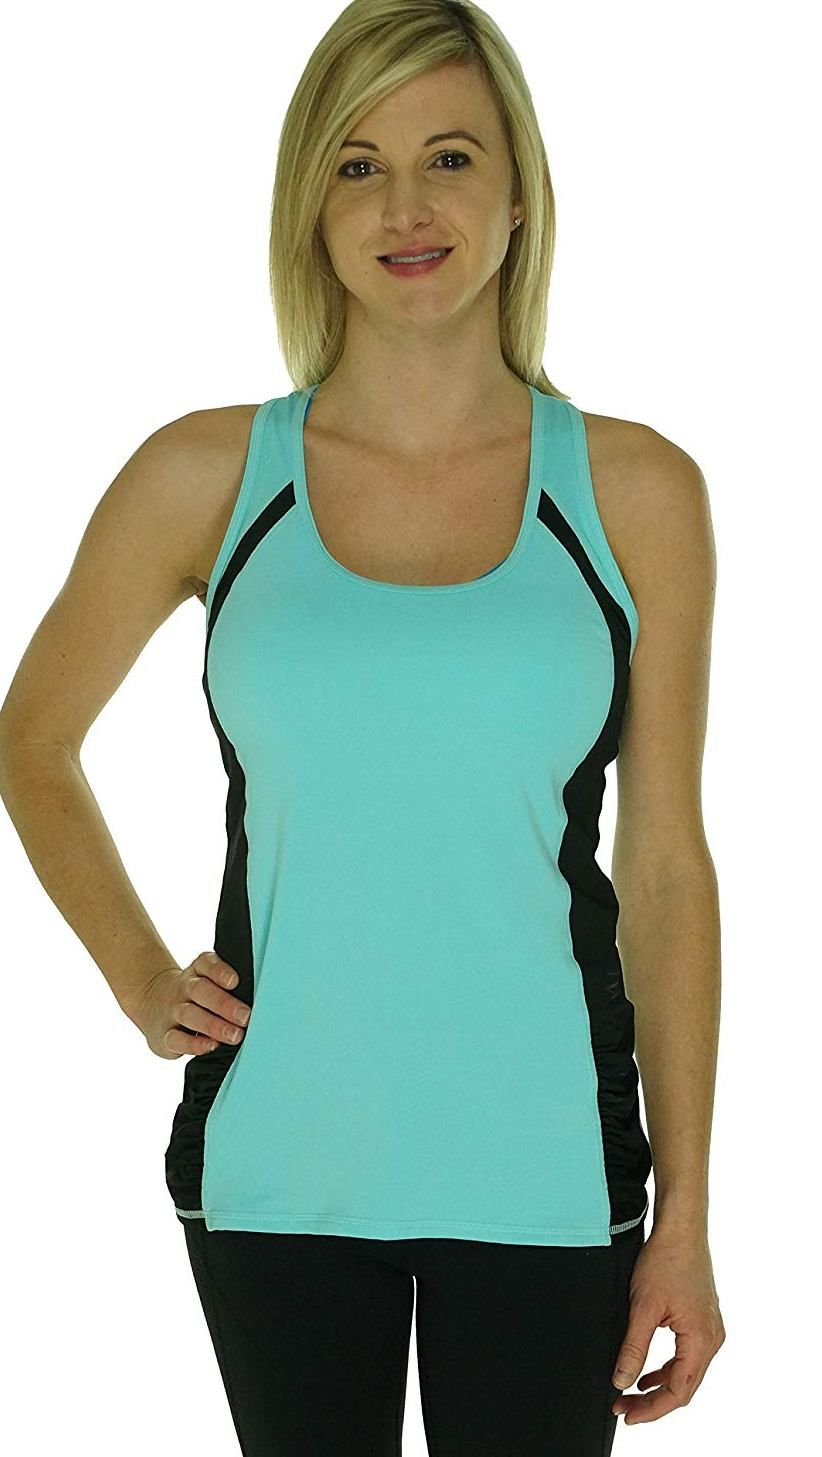 02e89b66a Ideology Women s Color block Tank Top. Built-in sports bra ...